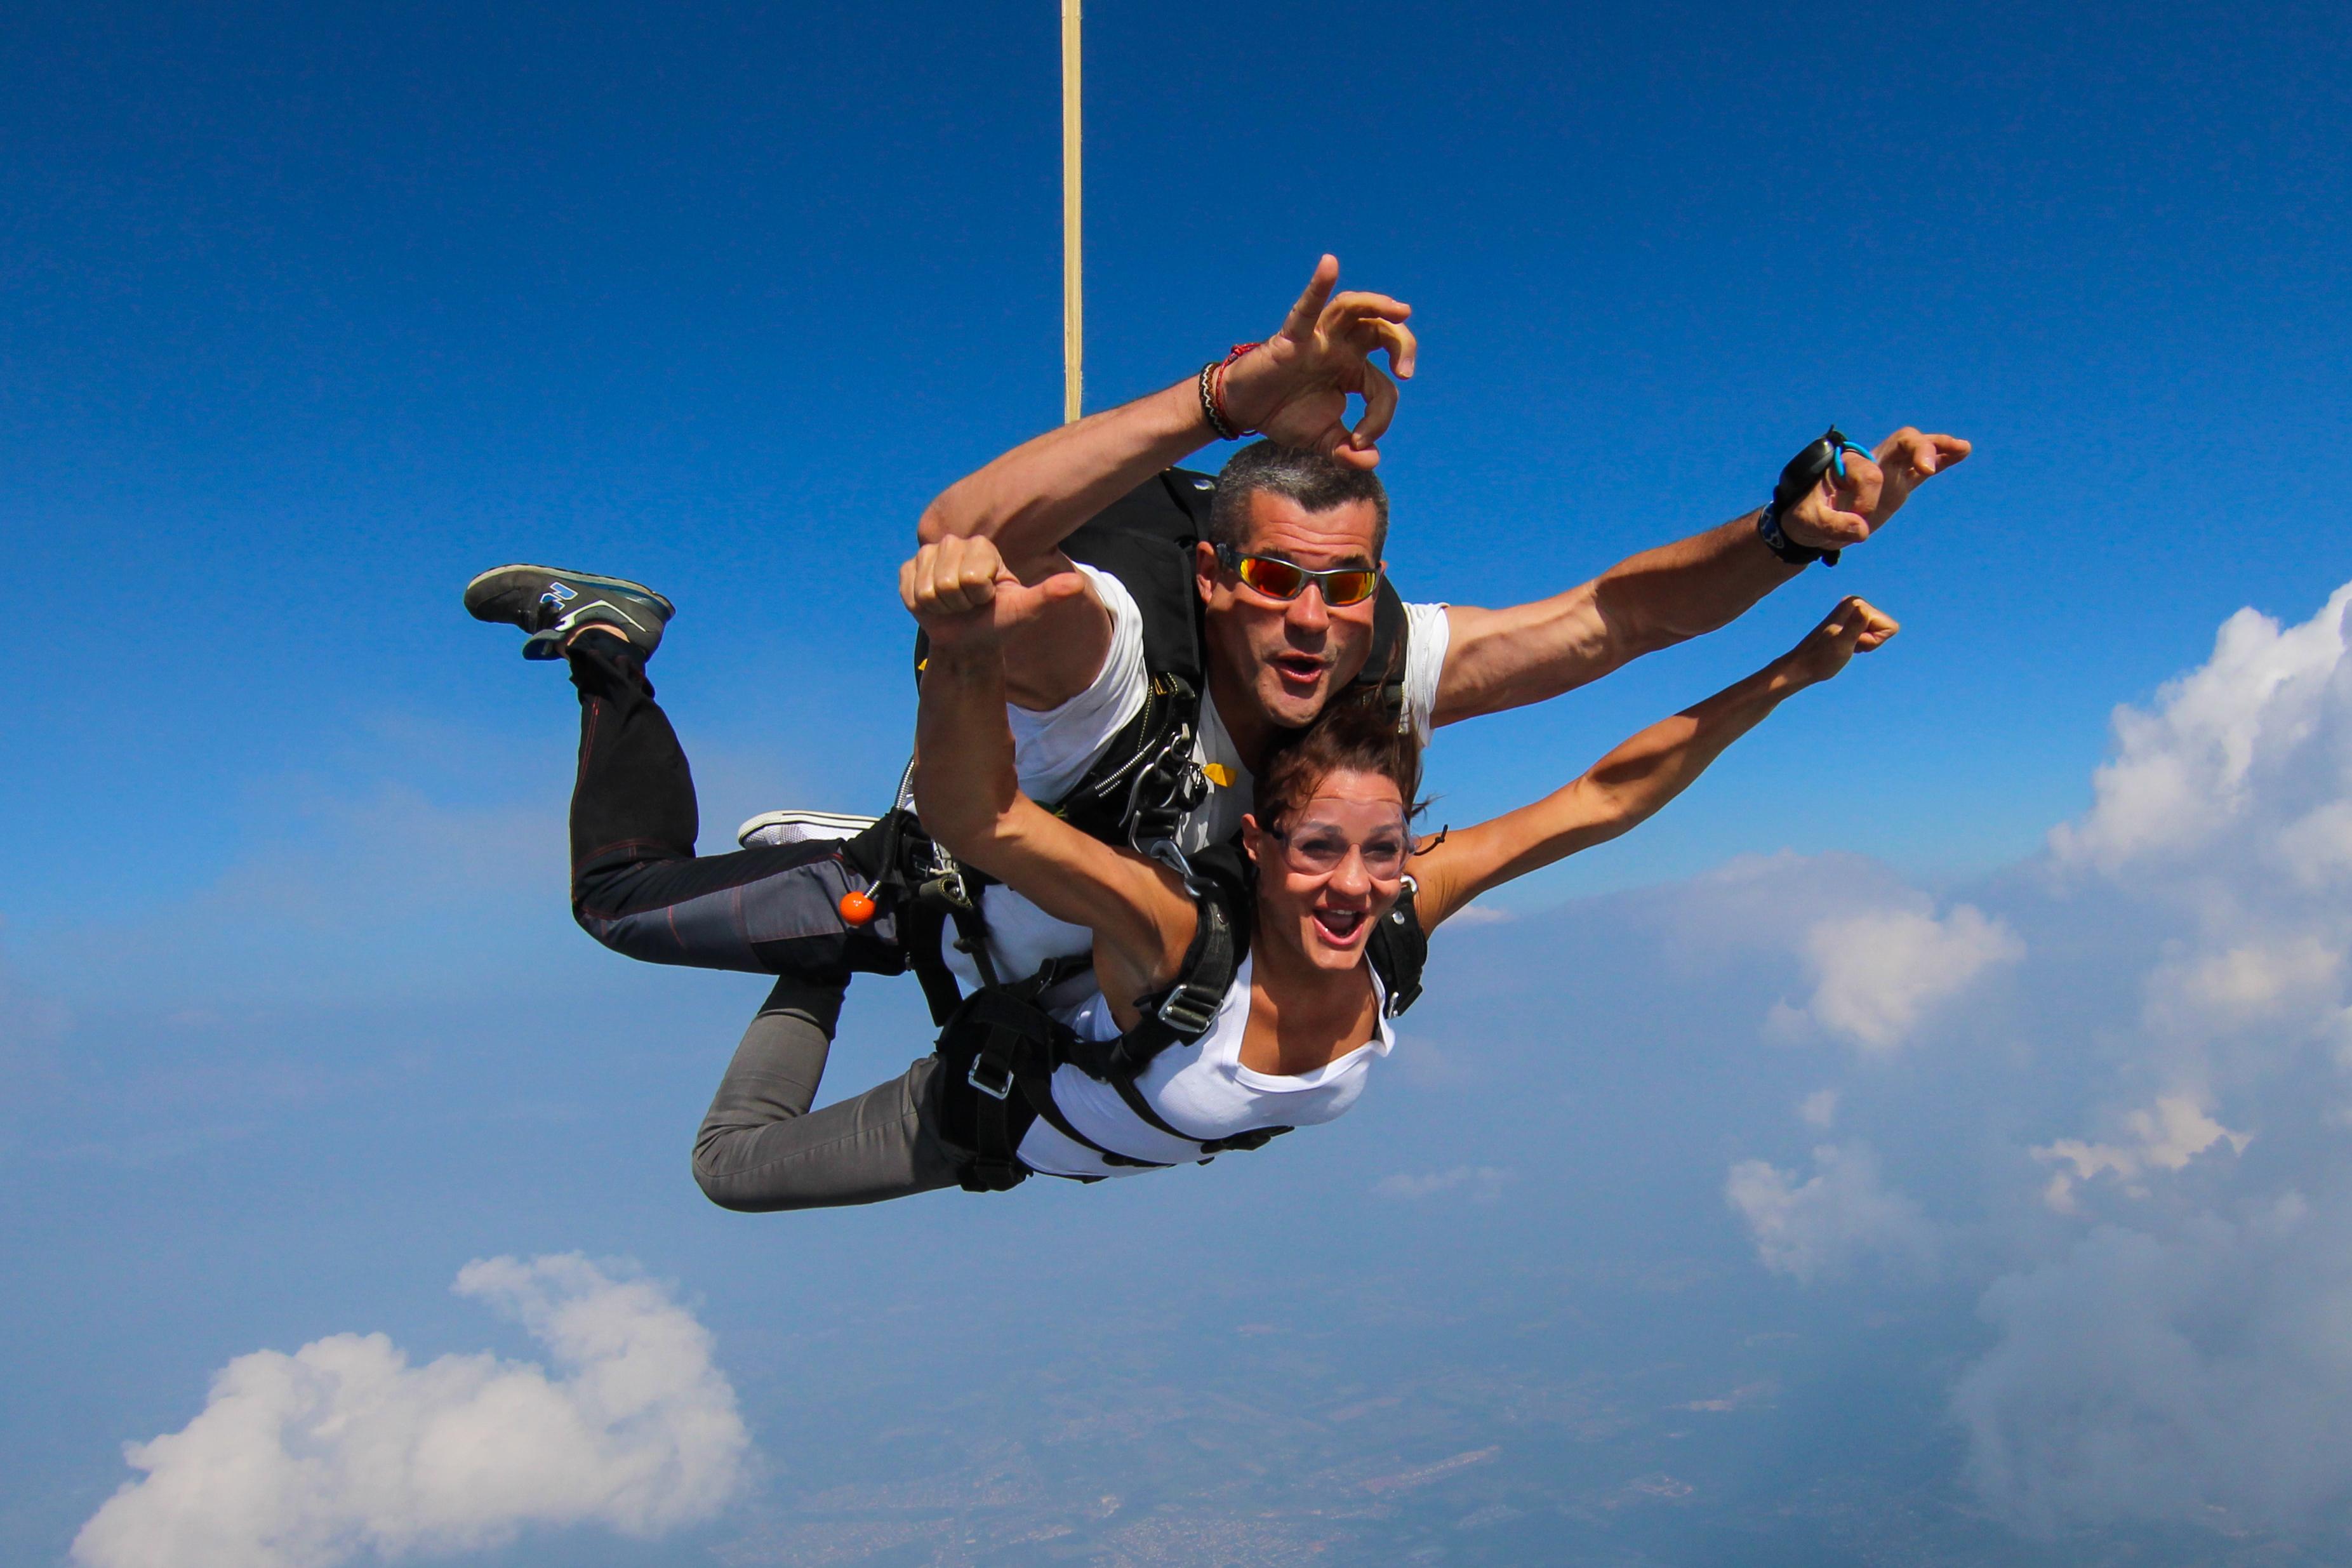 skok ze spadochronem dla 2 osób